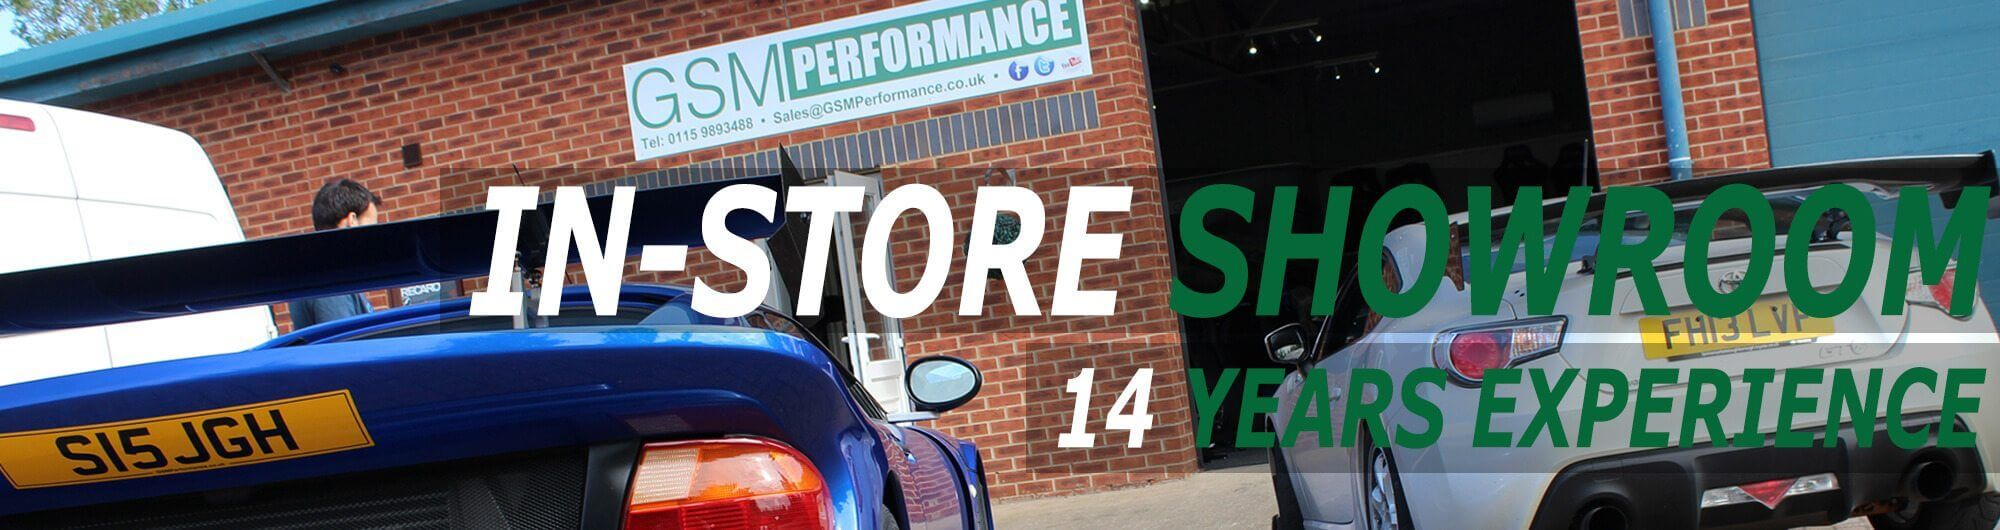 gsm-performance-showroom-exterior-hero